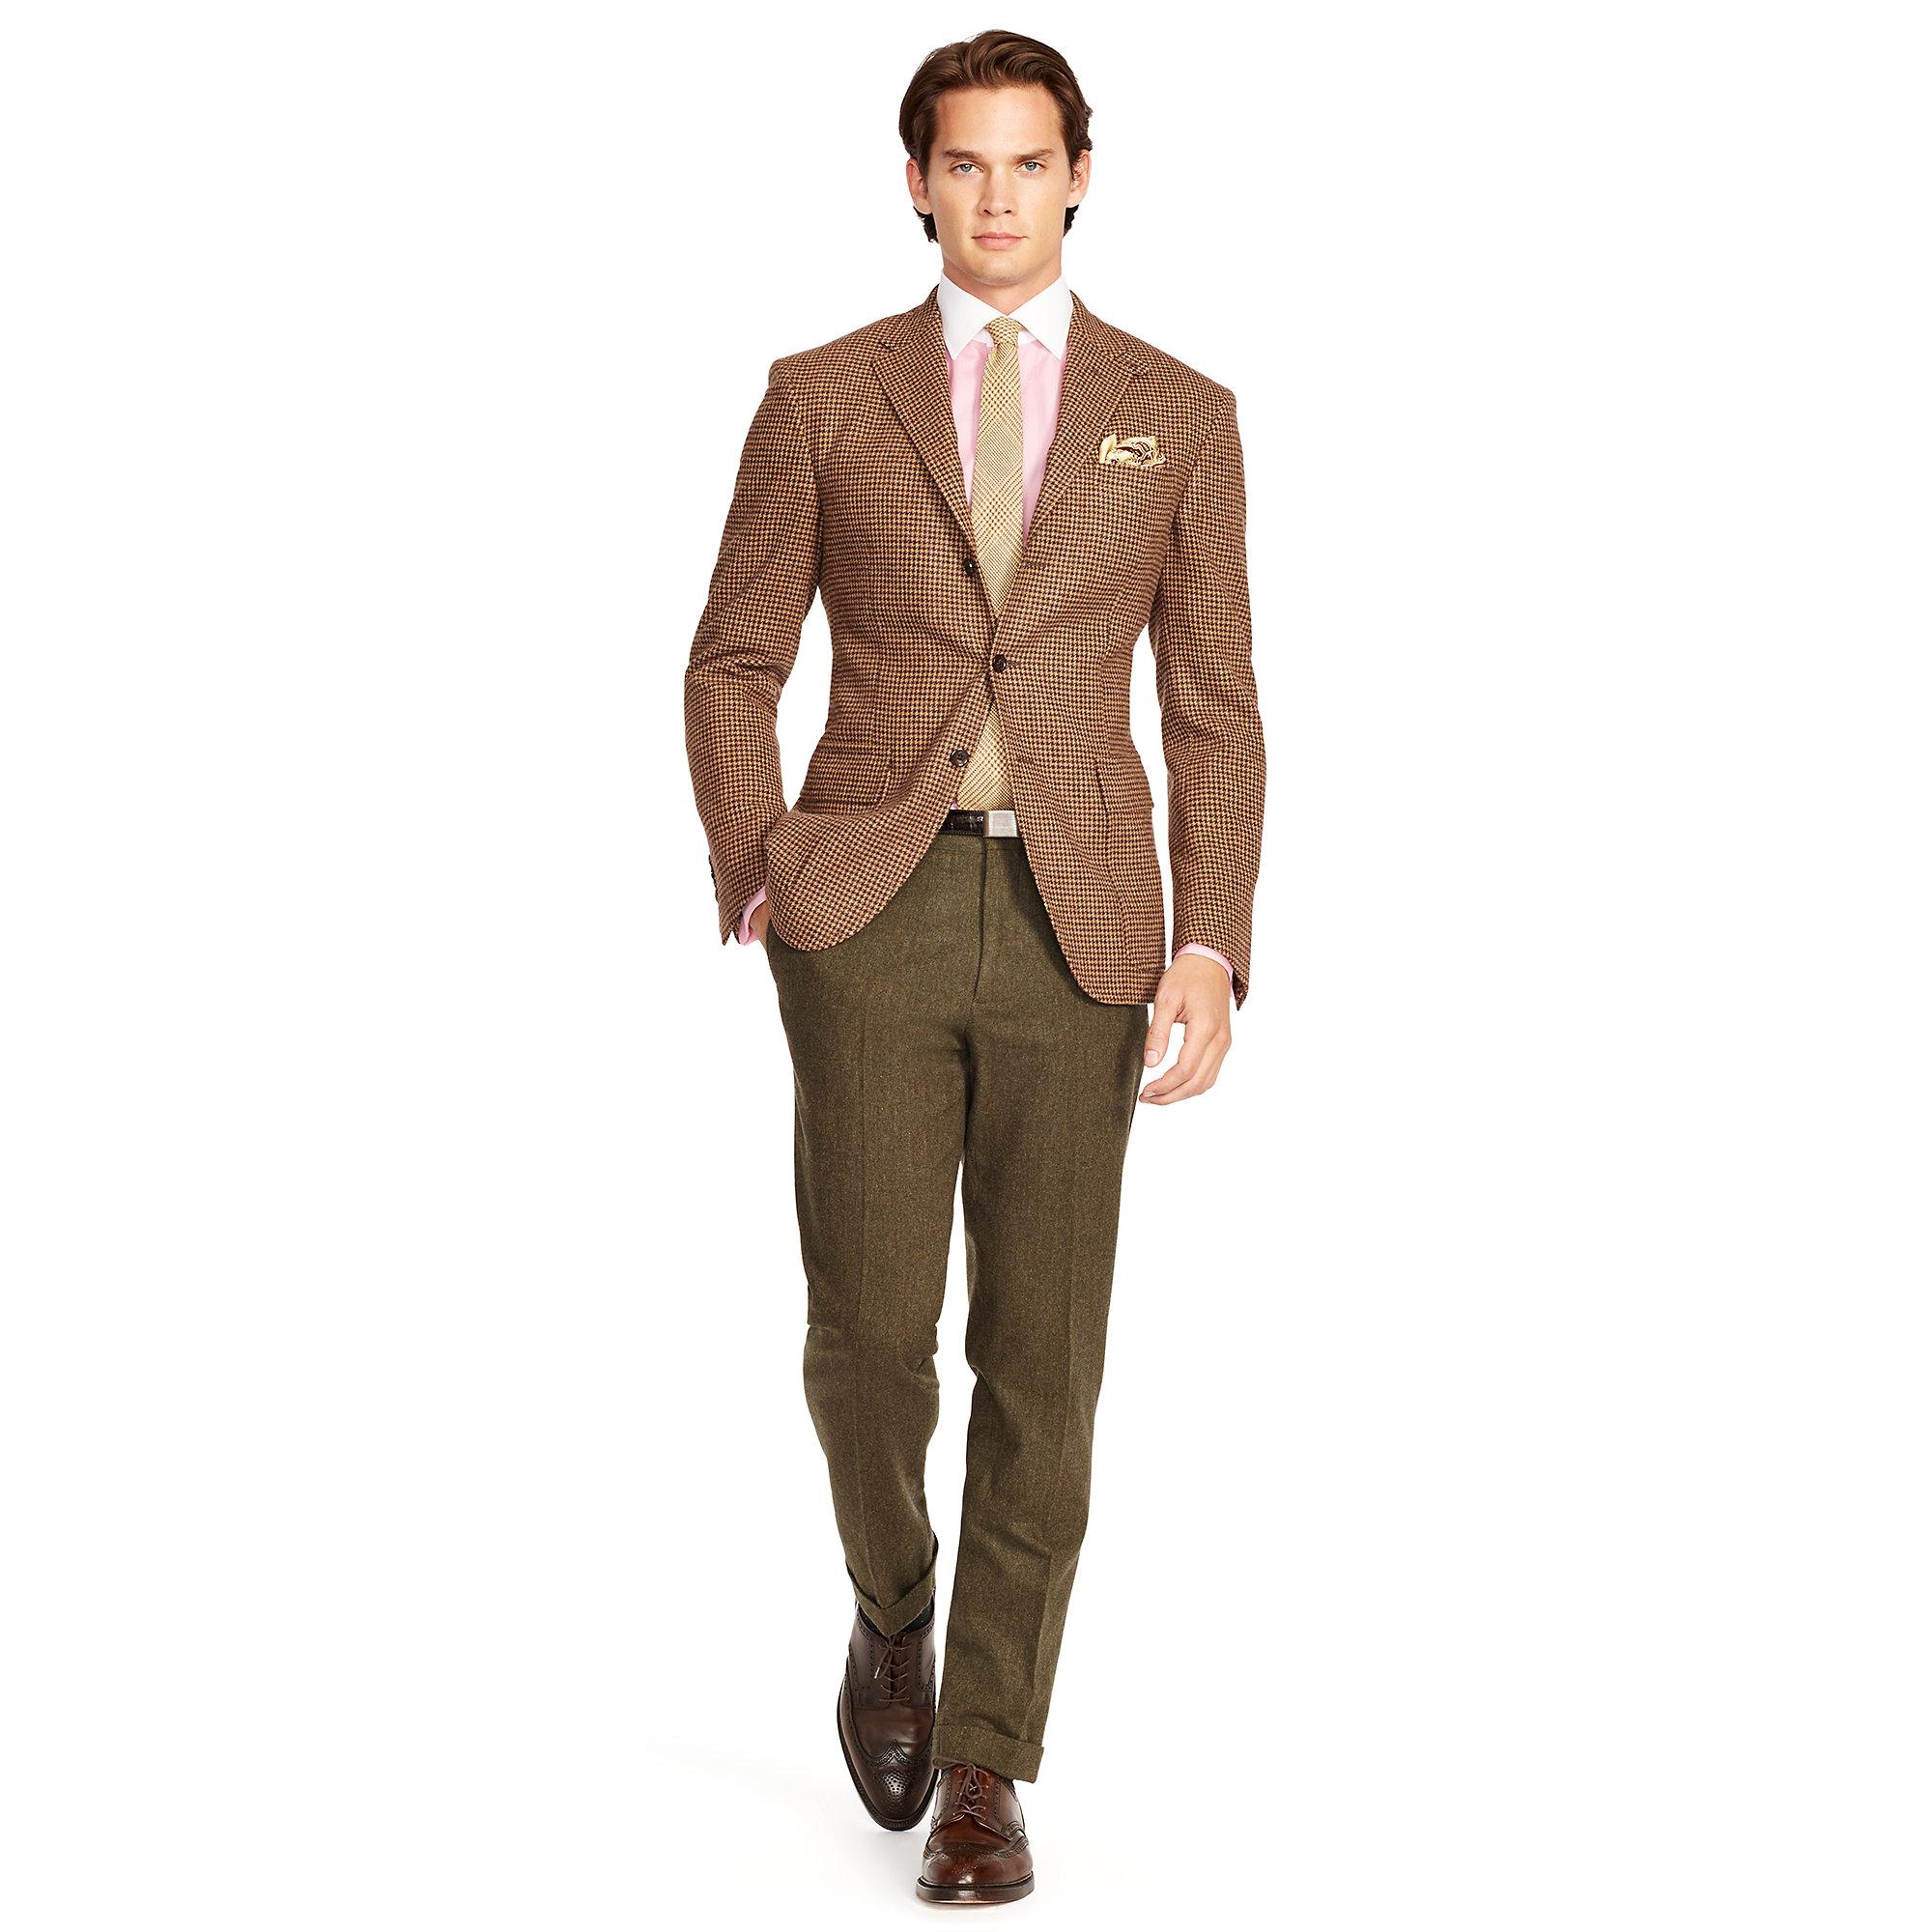 0c2dc6164a9 Lyst - Polo Ralph Lauren Slim-fit Herringbone Trouser in Brown for Men